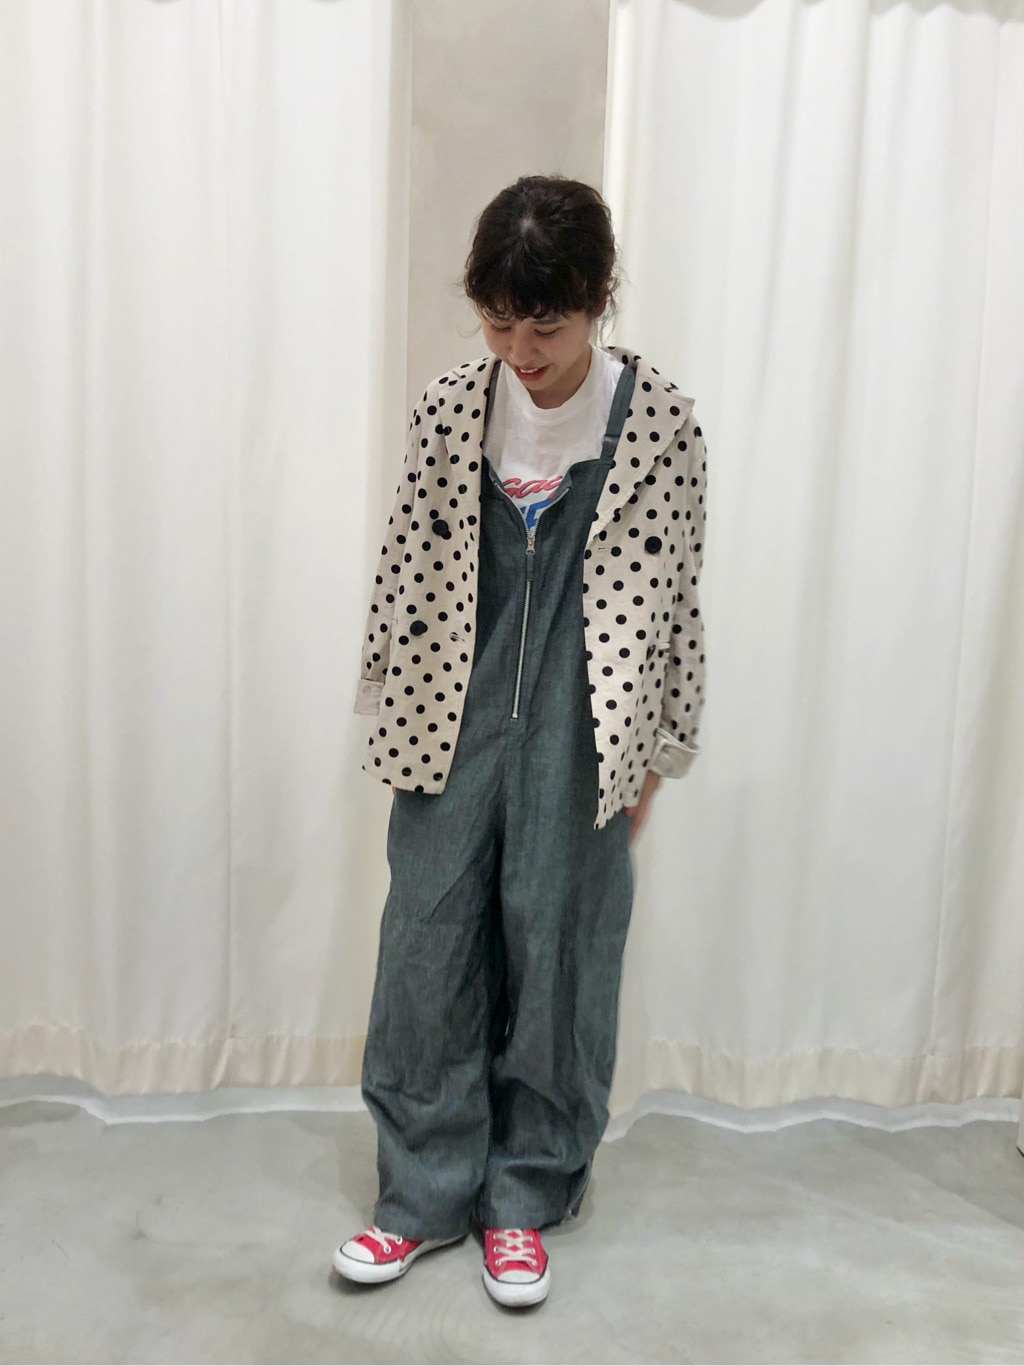 - CHILD WOMAN CHILD WOMAN , PAR ICI 東京スカイツリータウン・ソラマチ 身長:160cm 2021.05.28